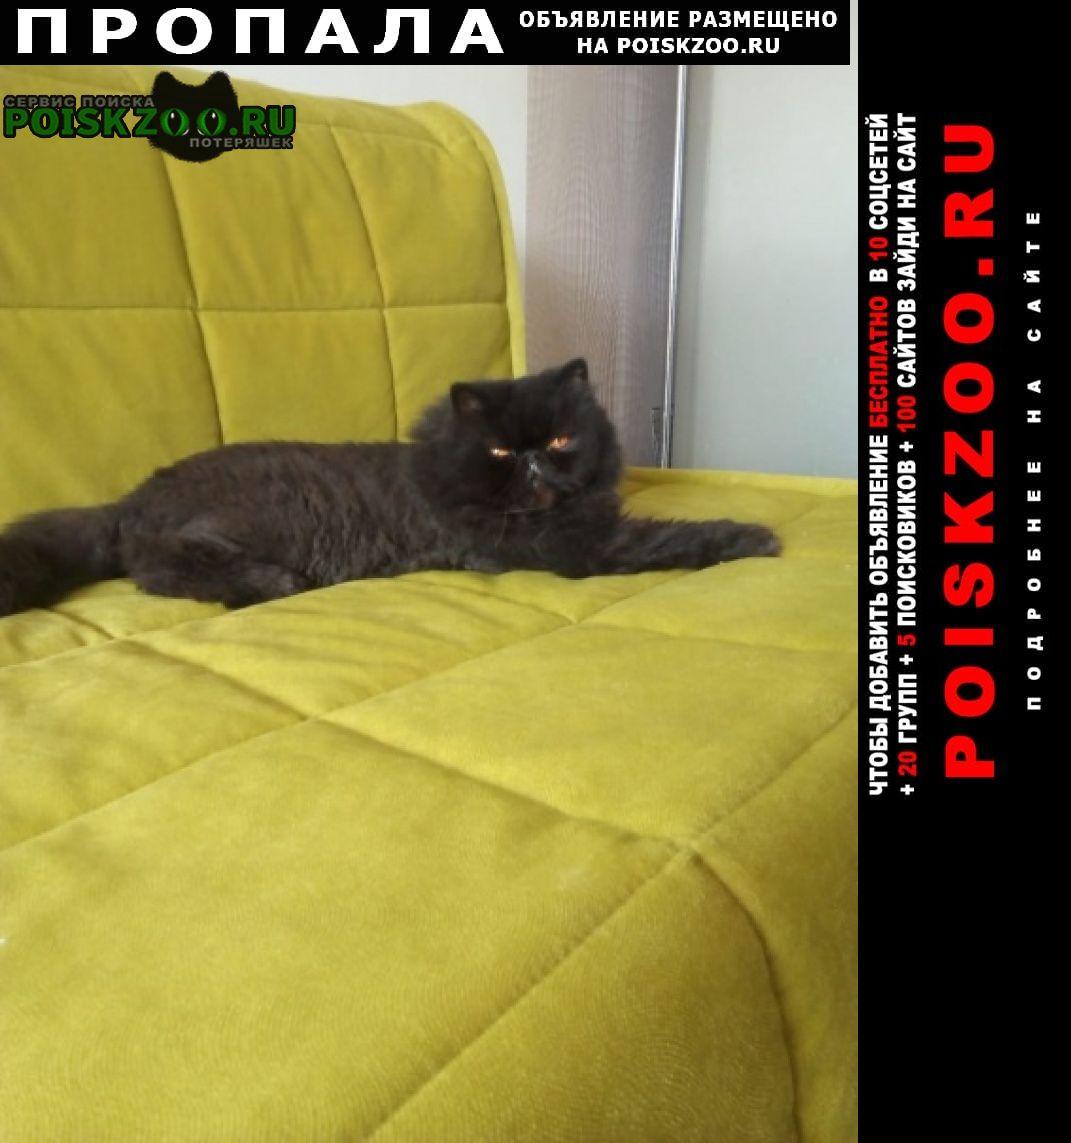 Пропал кот любимец, Краснодар